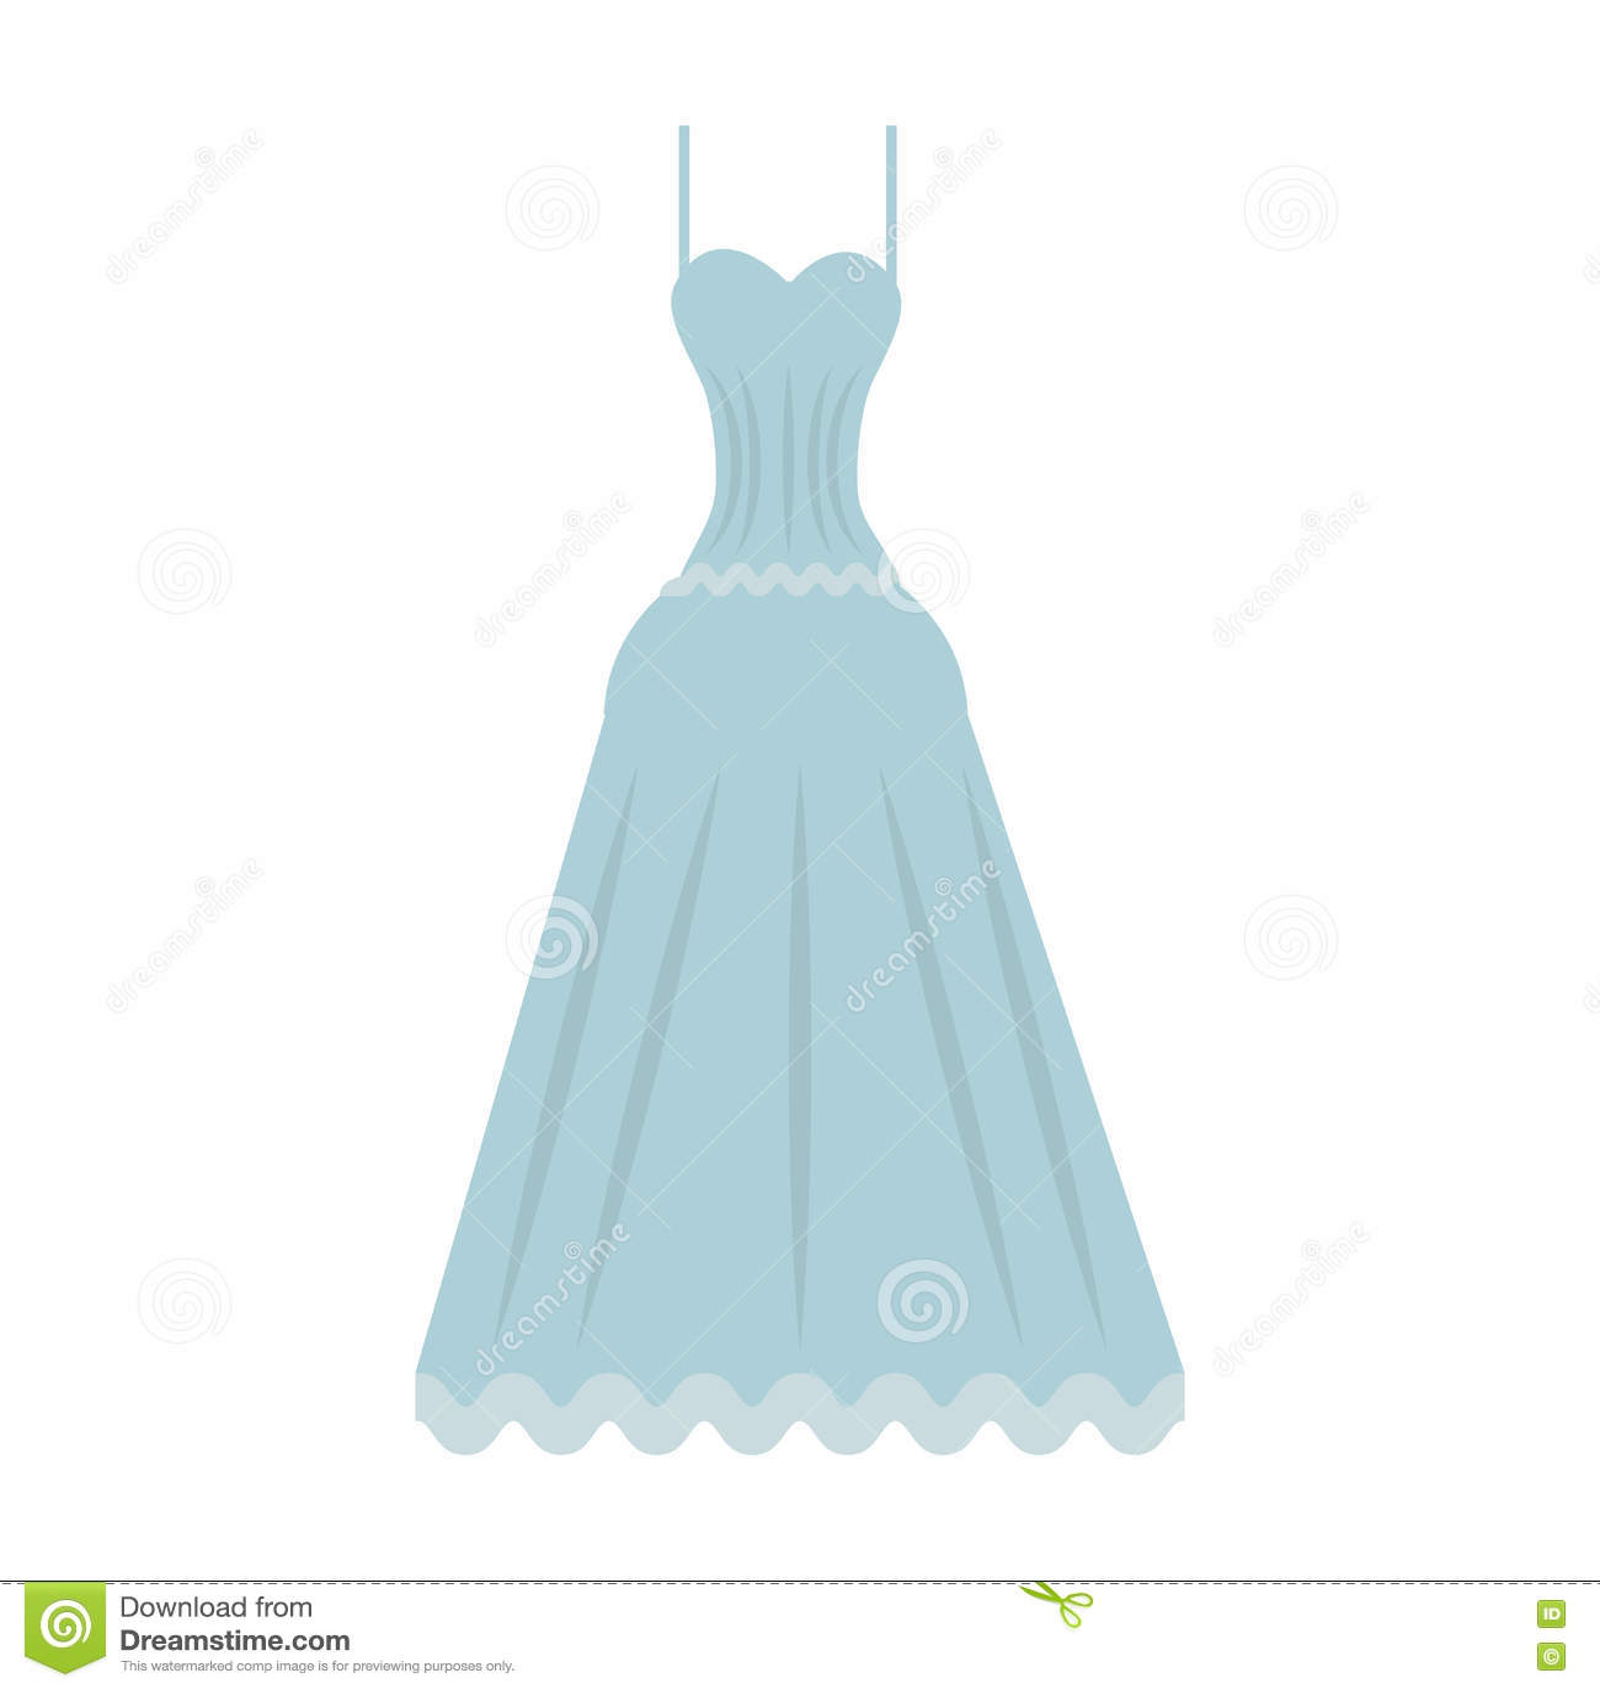 Cute wedding dress icon stock vector. Illustration of illustration ...